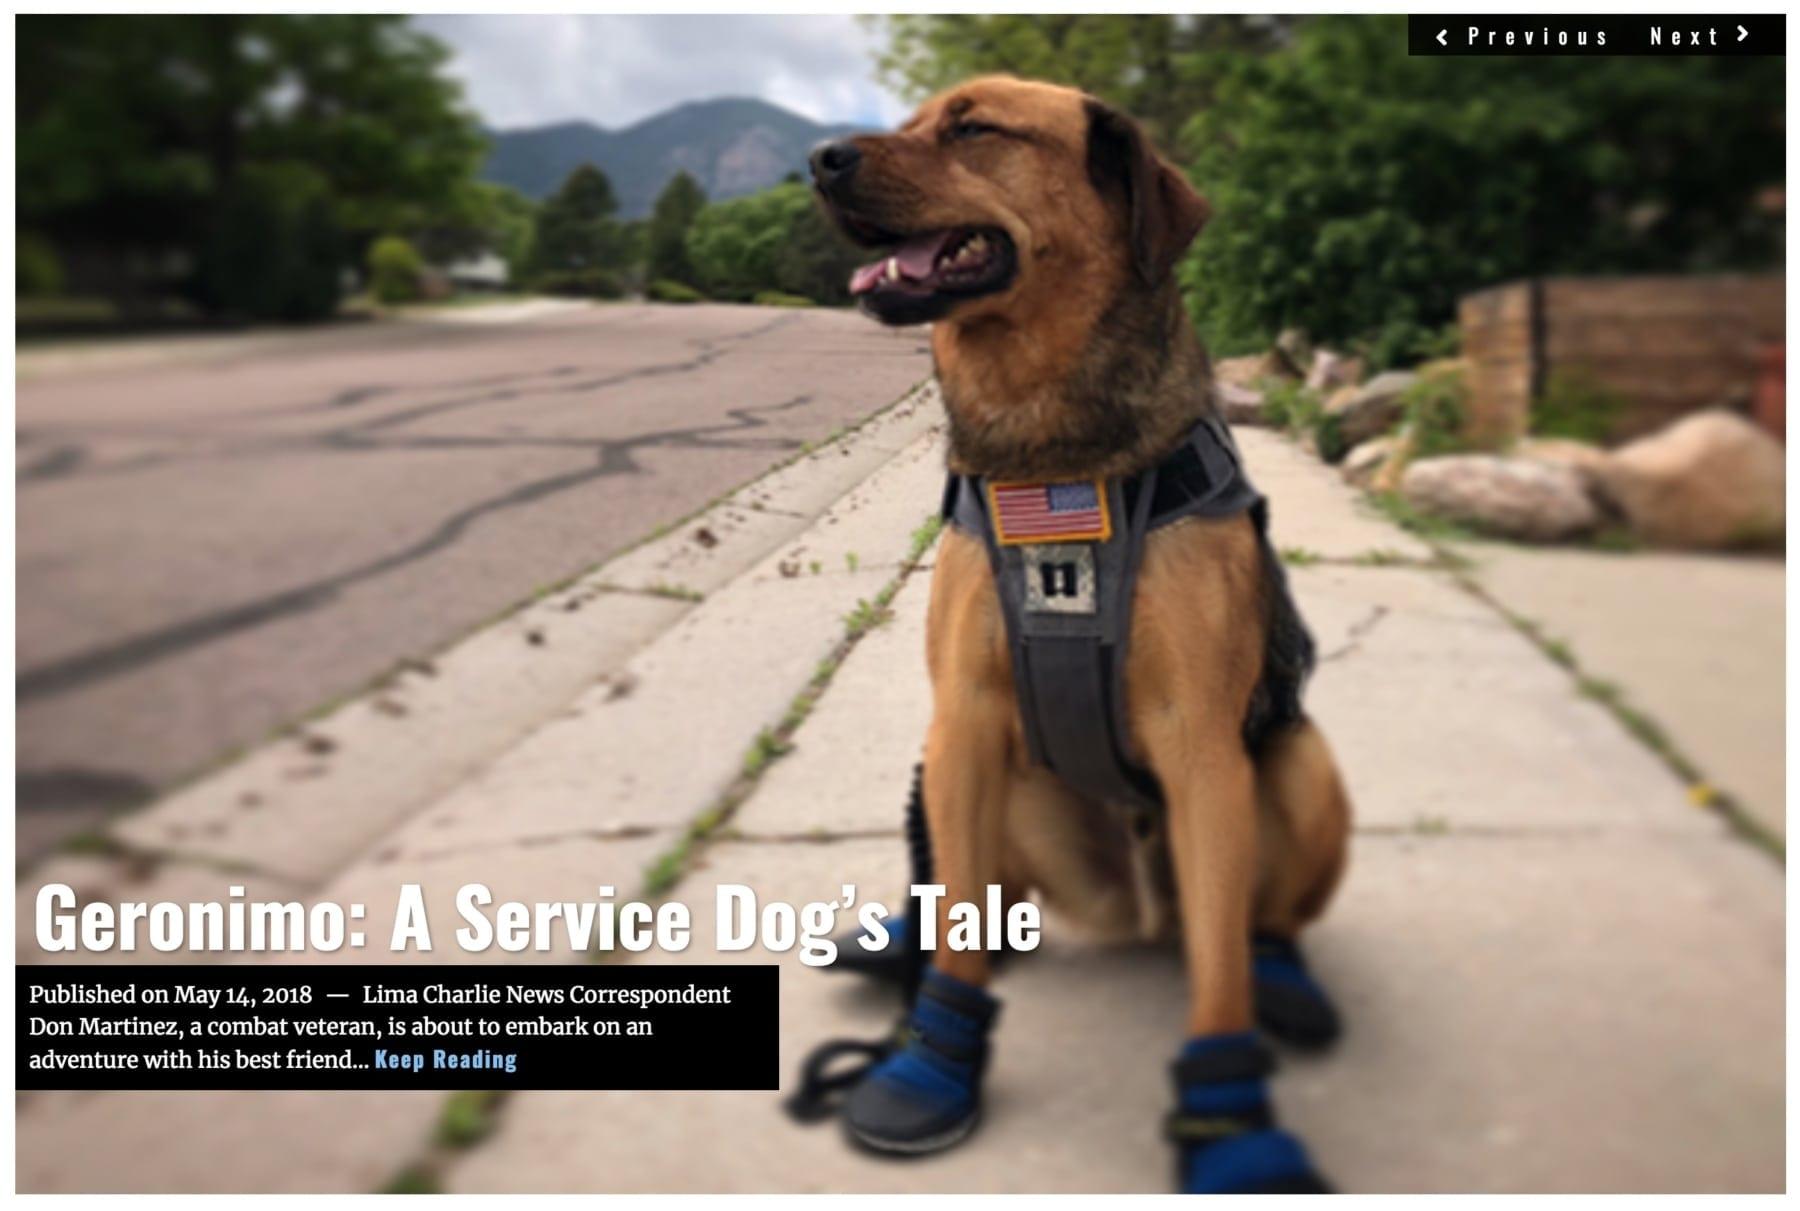 Image Lima Charlie News Headline Geronimo A Service Dogs Tale D.Martinez MAY 14 2018